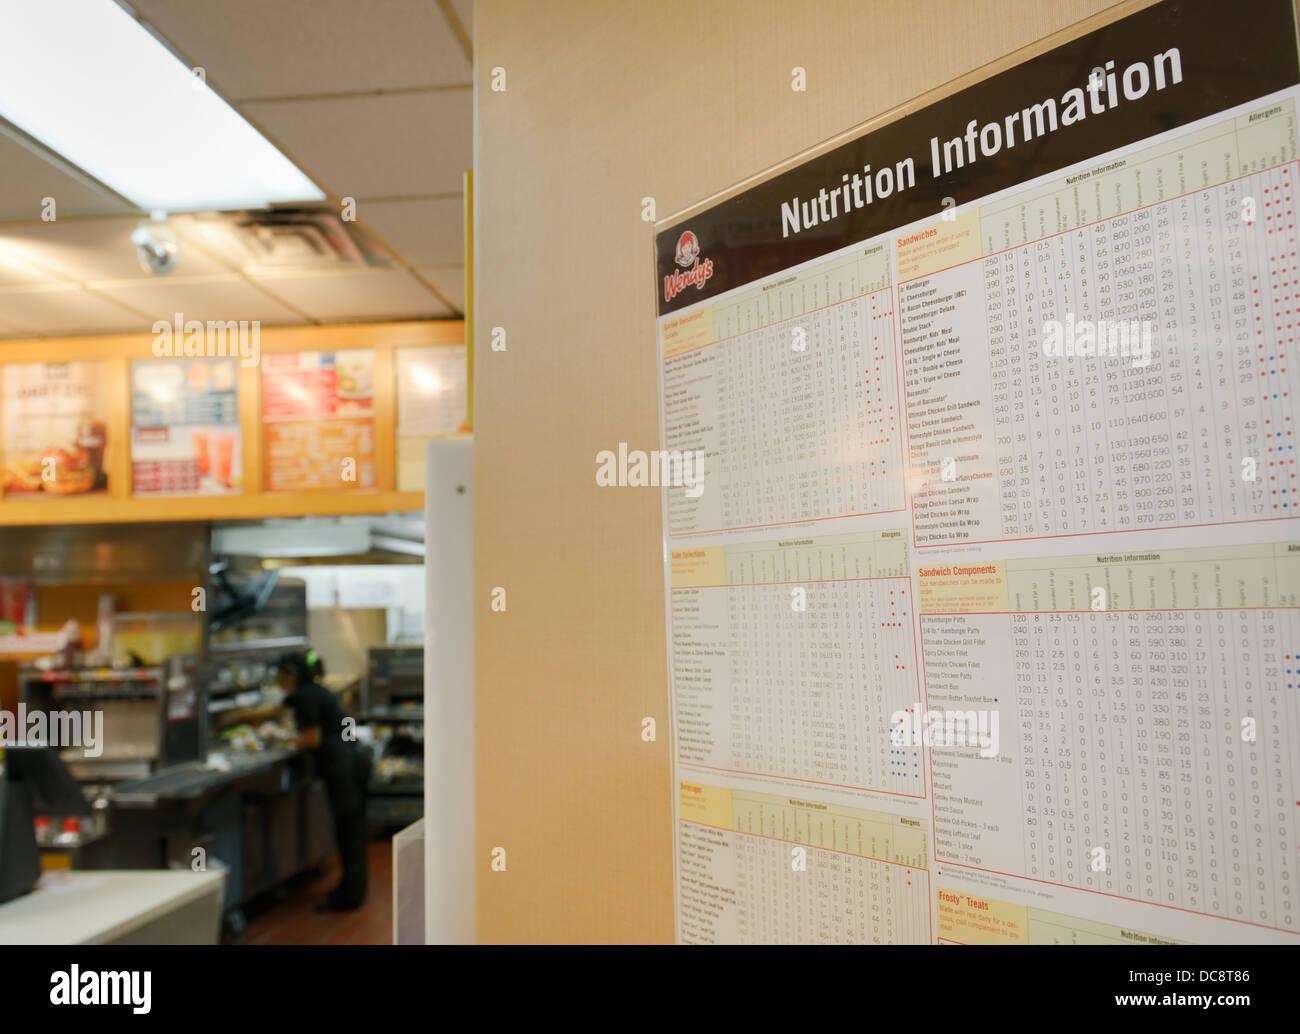 Nährwertangaben, die Buchung bei einem Fast-Food Restaurant, NJ, USA Stockbild